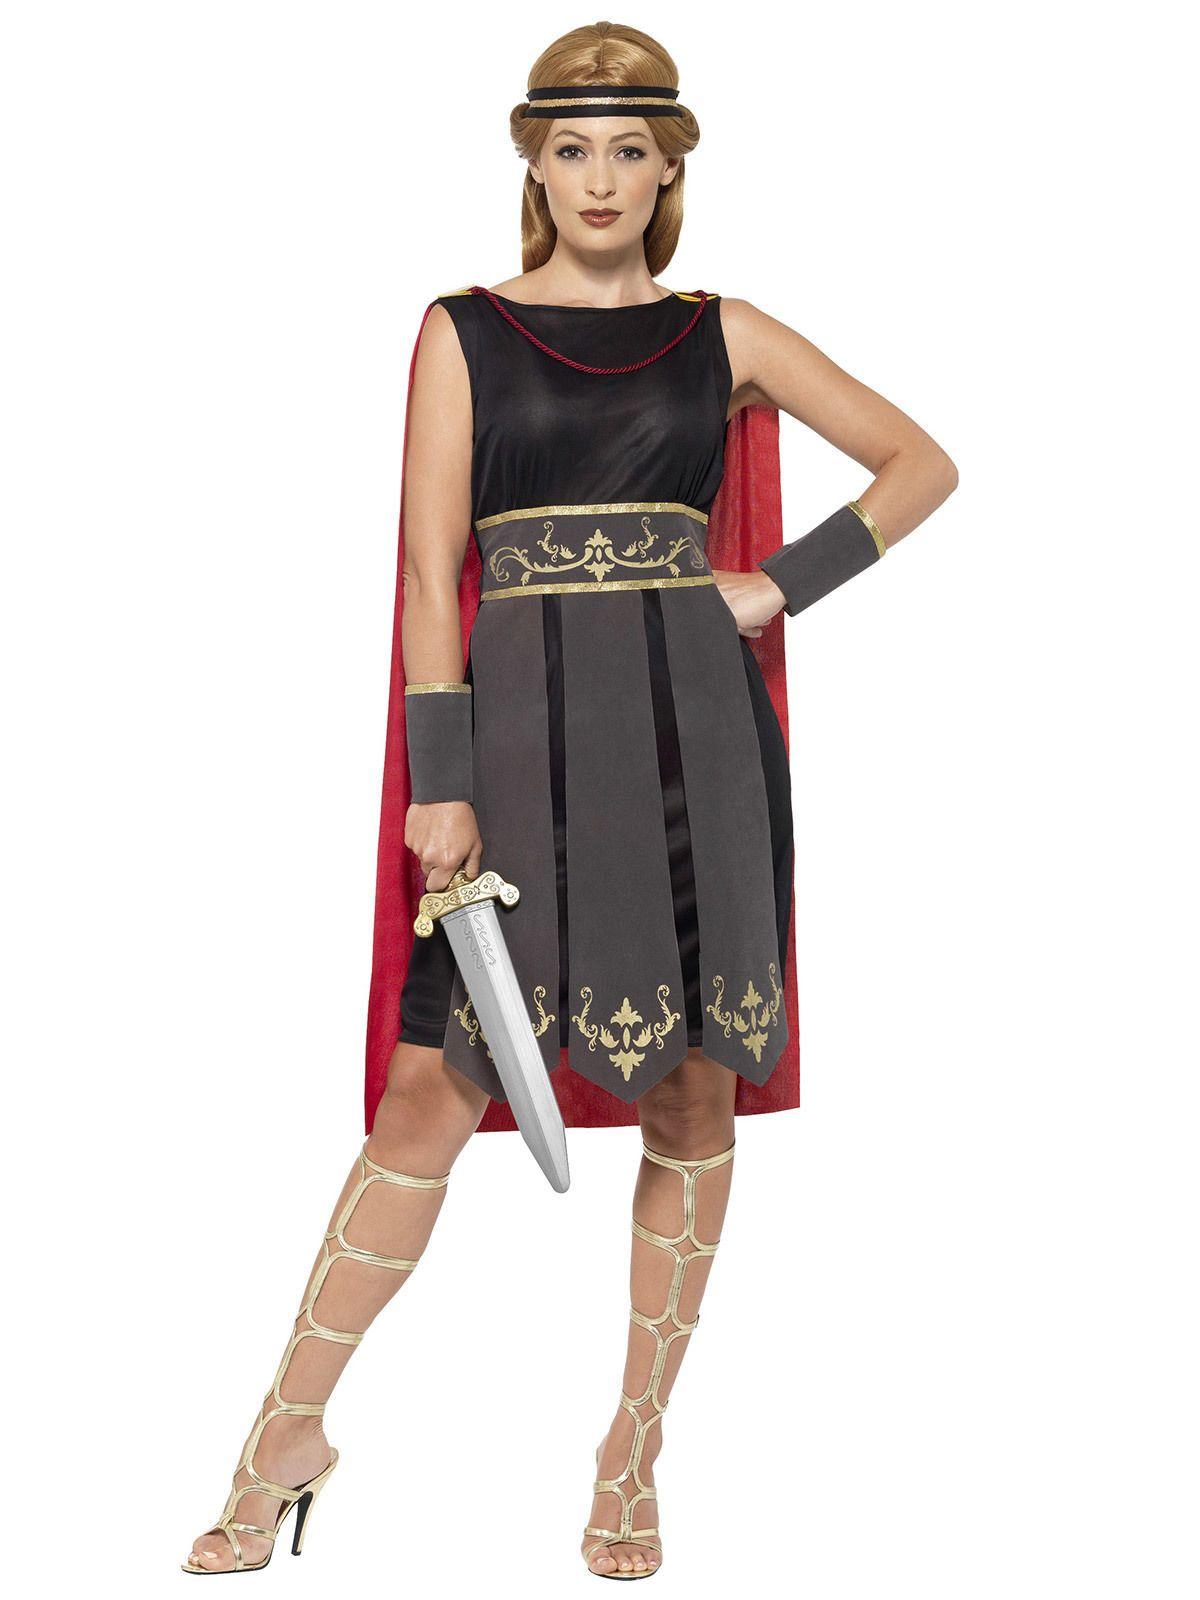 34e93f8ff068f Gladiatorin Damenkostüm Antike Kriegerin schwarz-rot | Queen ...